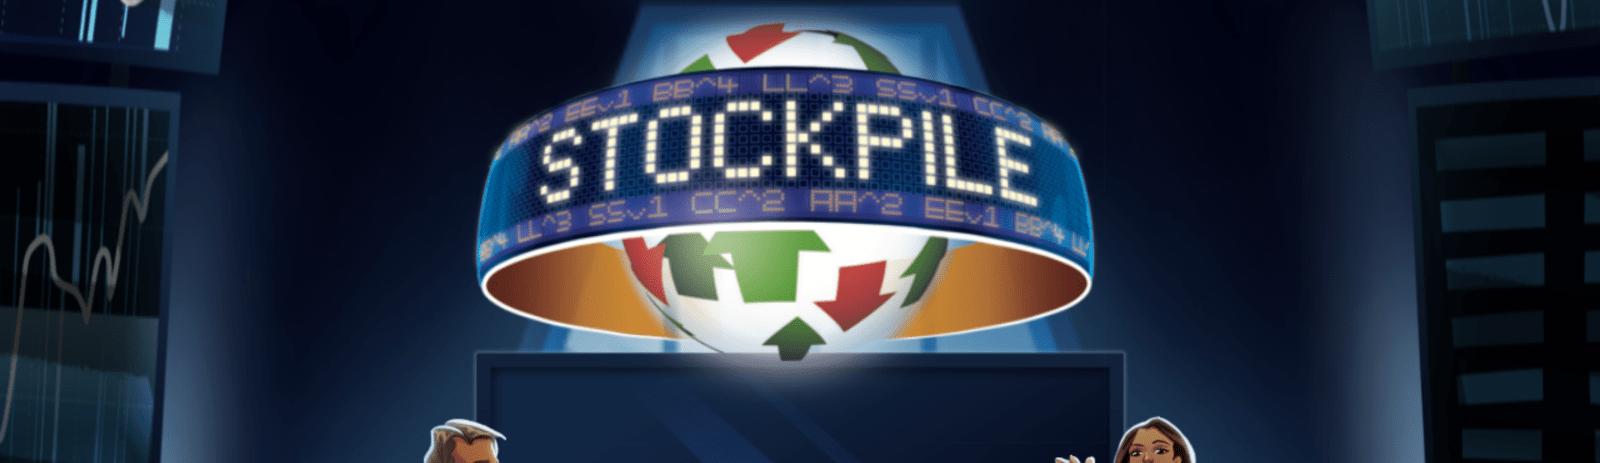 stockpile - feature